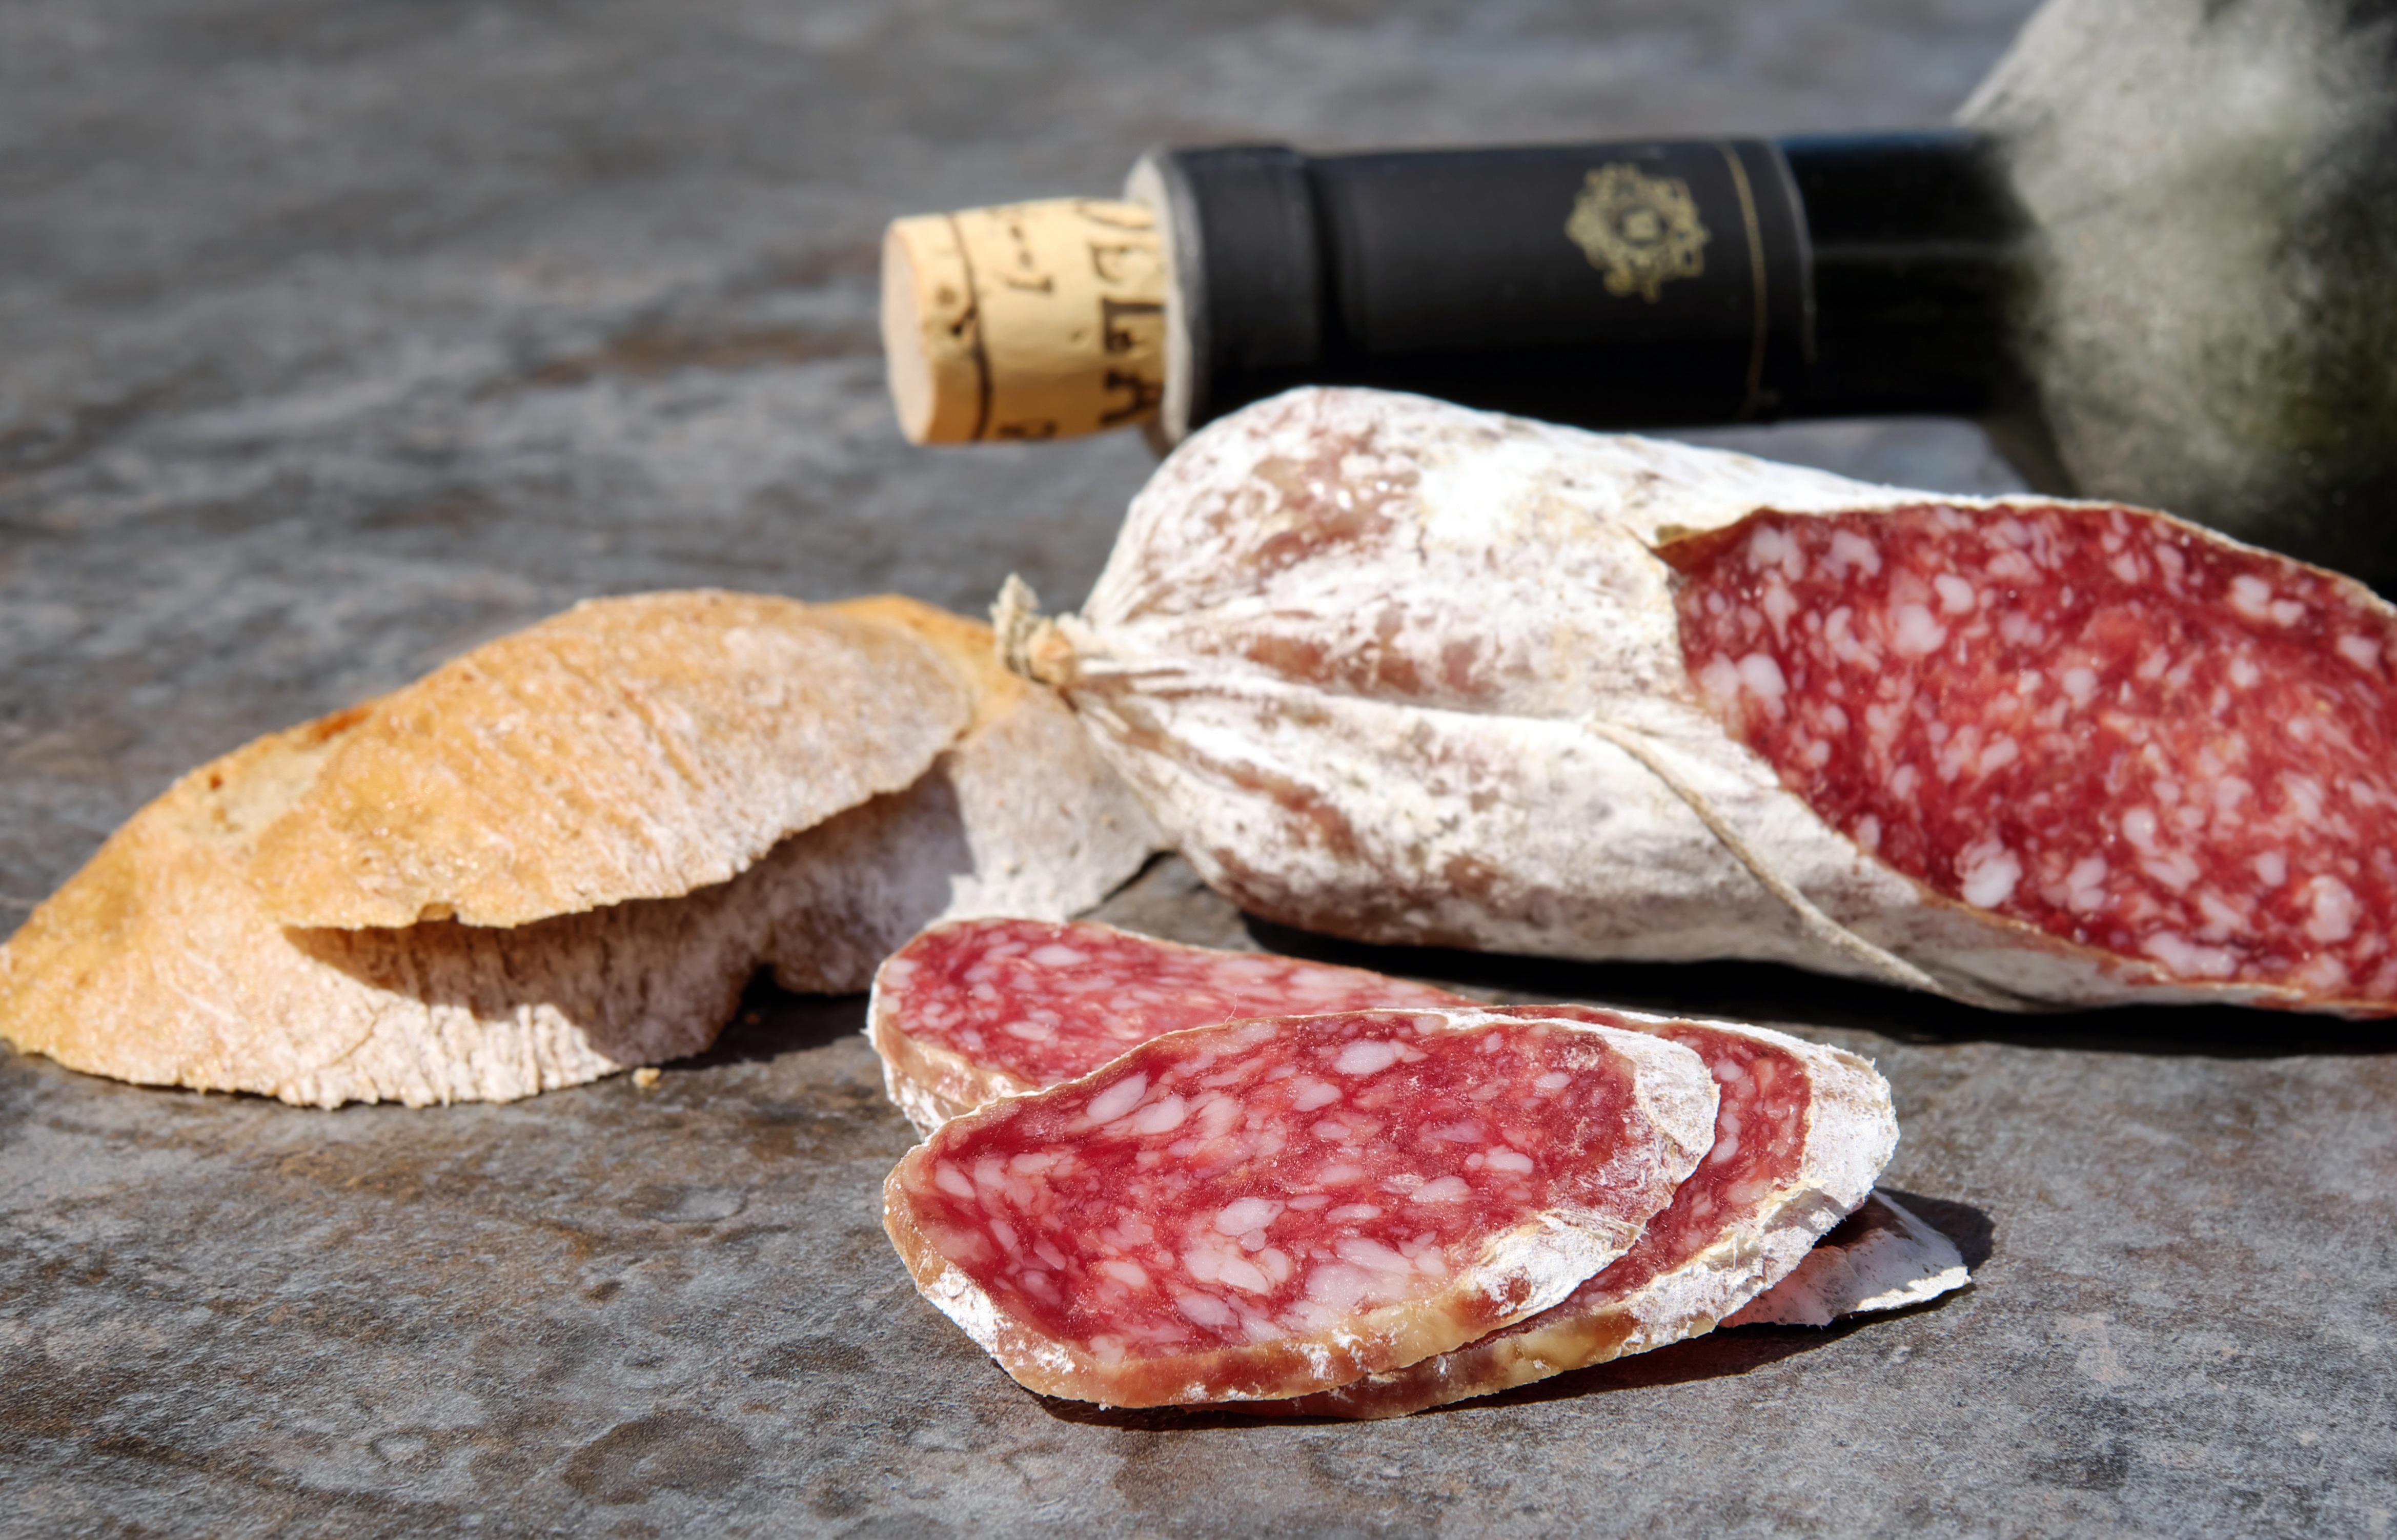 salami 2645403 - [Wino i kuchnia] Wino i wędliny